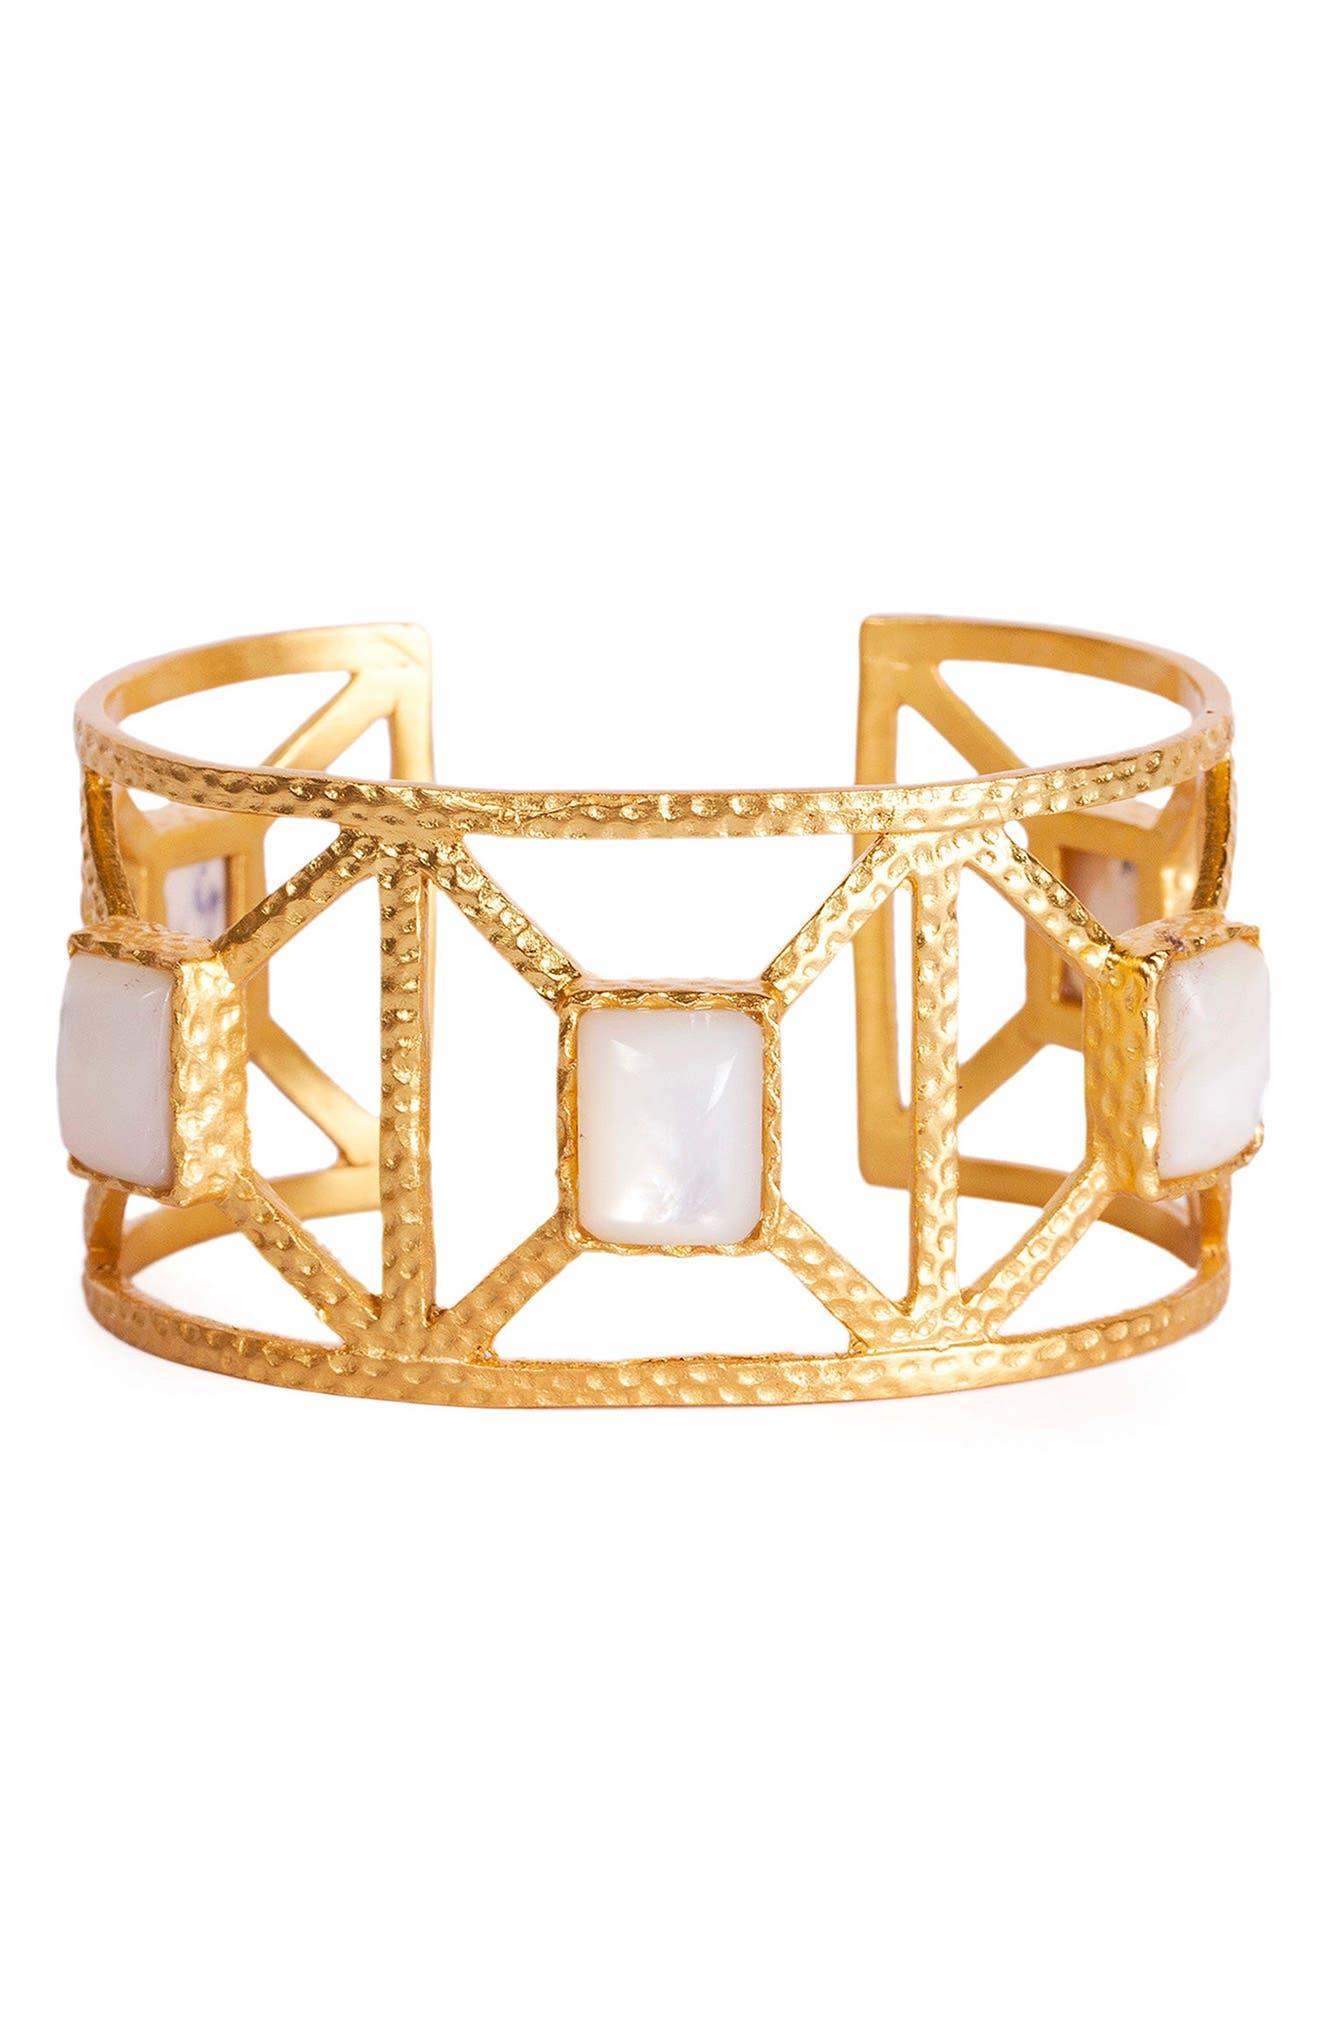 Lennox Cuff Bracelet